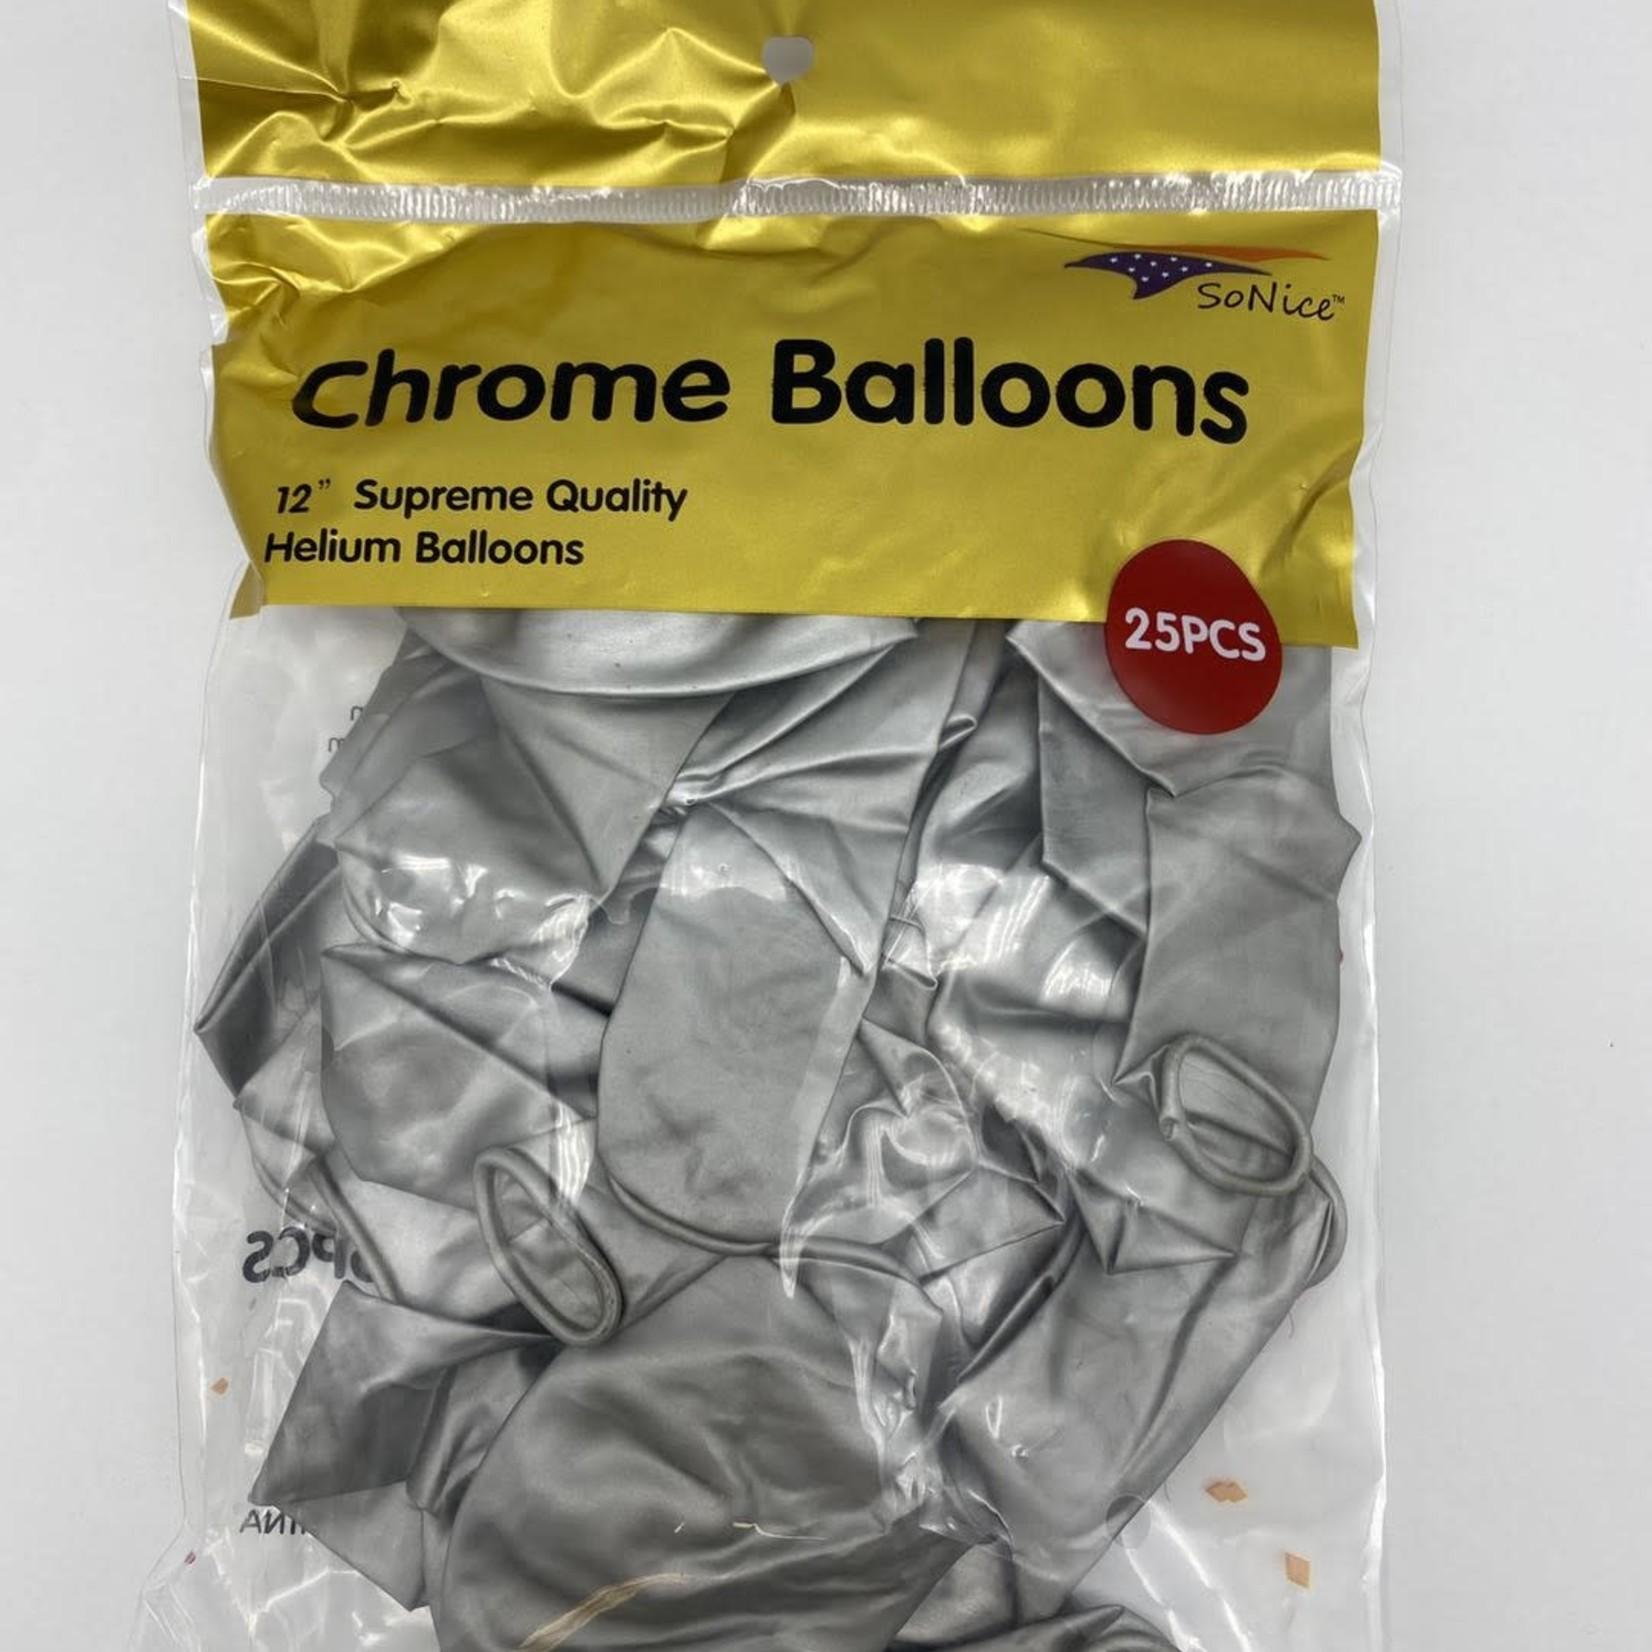 25 CT SILVER CHROME BALLOONS